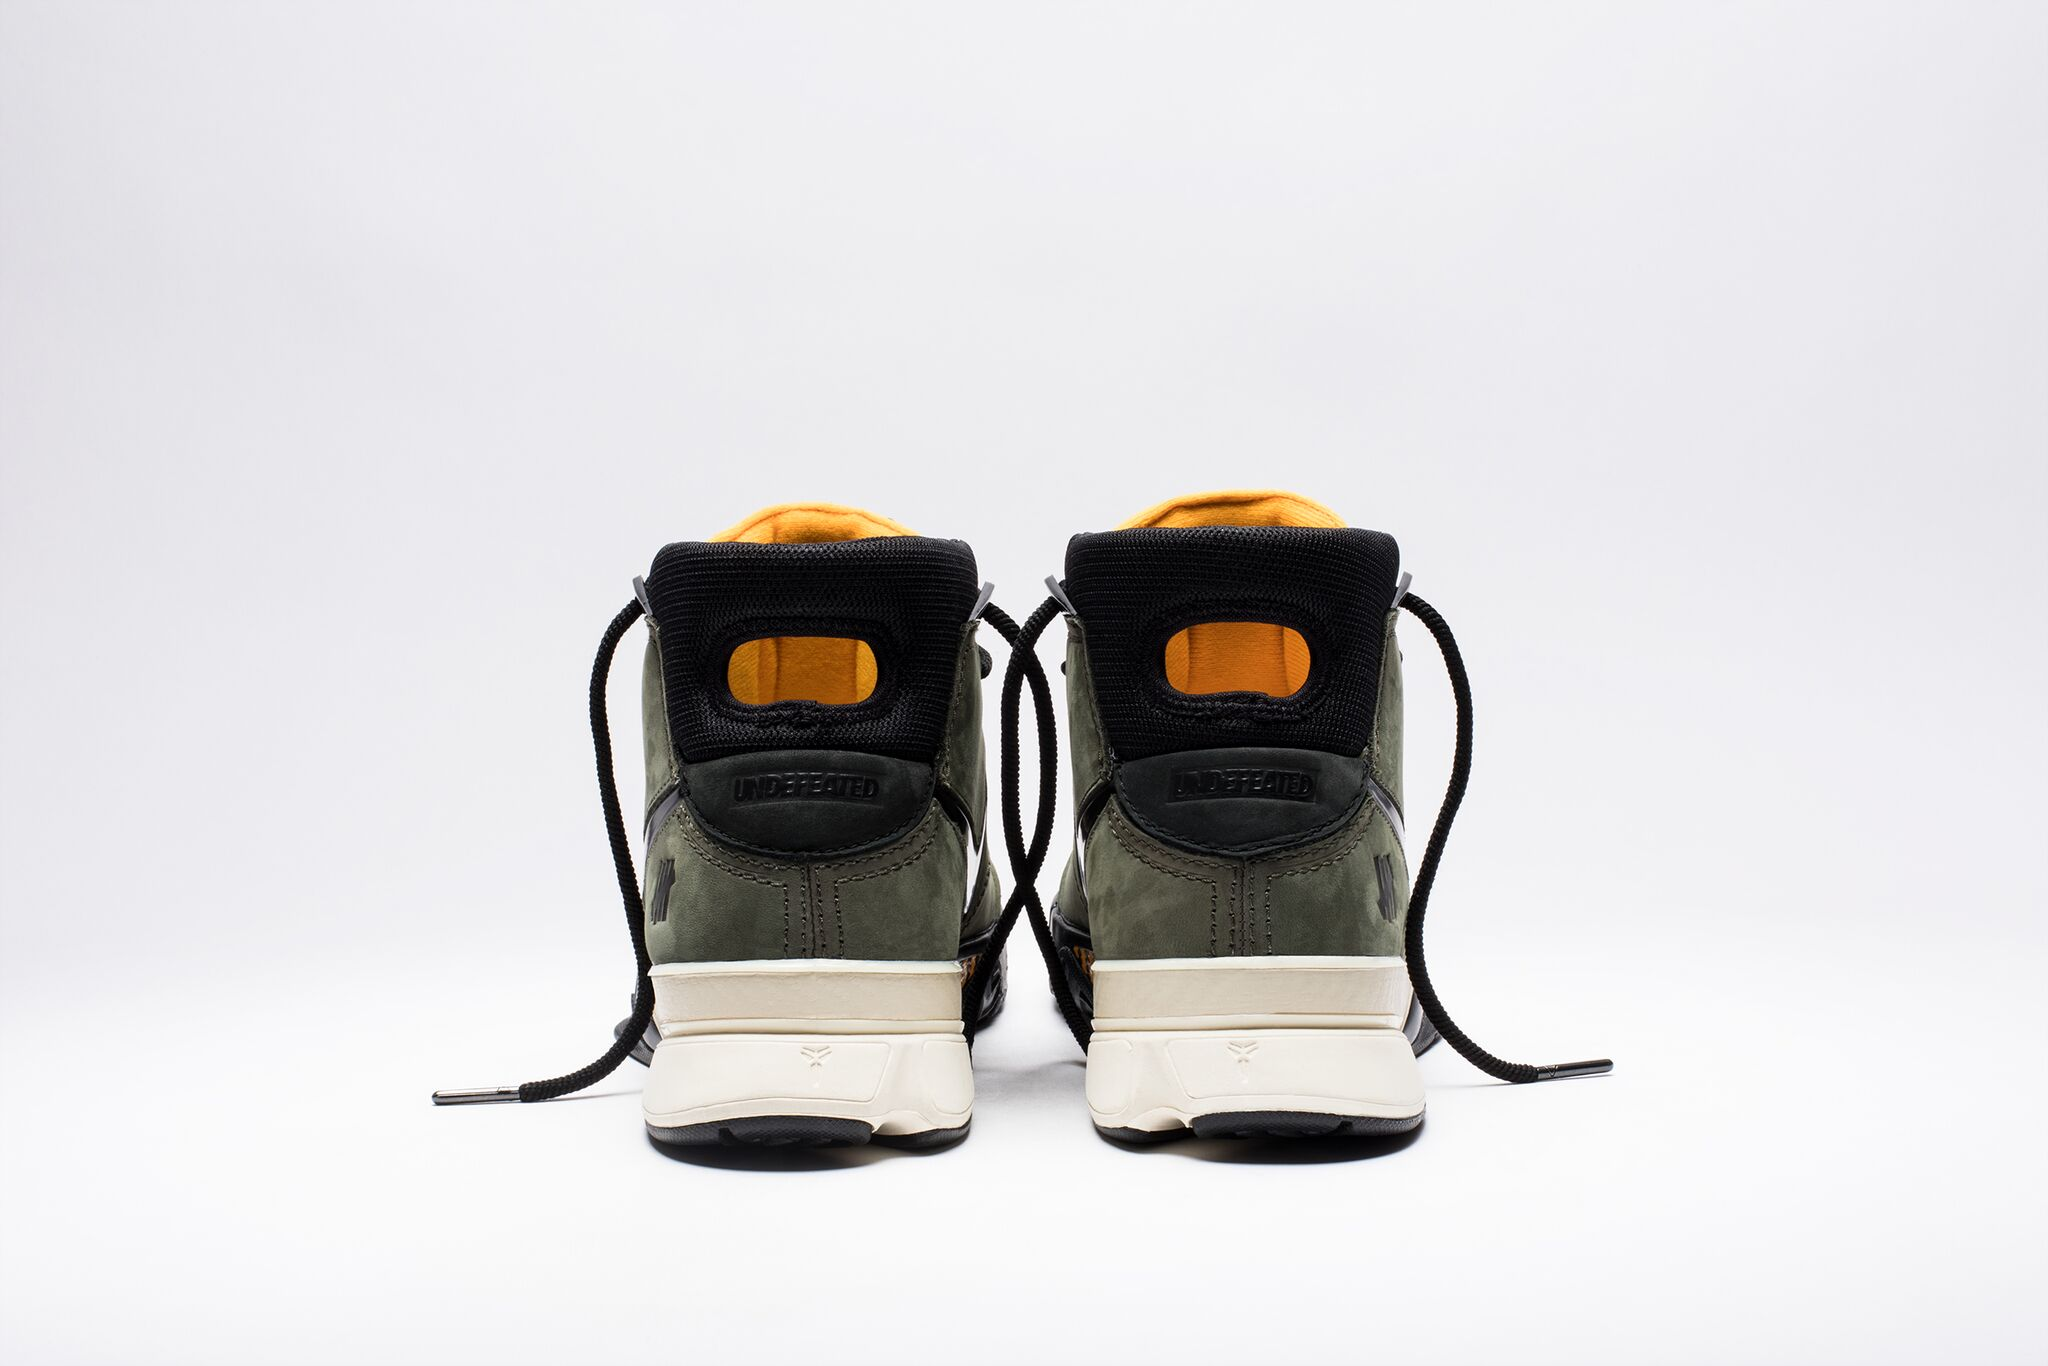 a239625707cc Nike-Kobe-1-Protro-UNDFTD-Flight-Jacket-3 - WearTesters